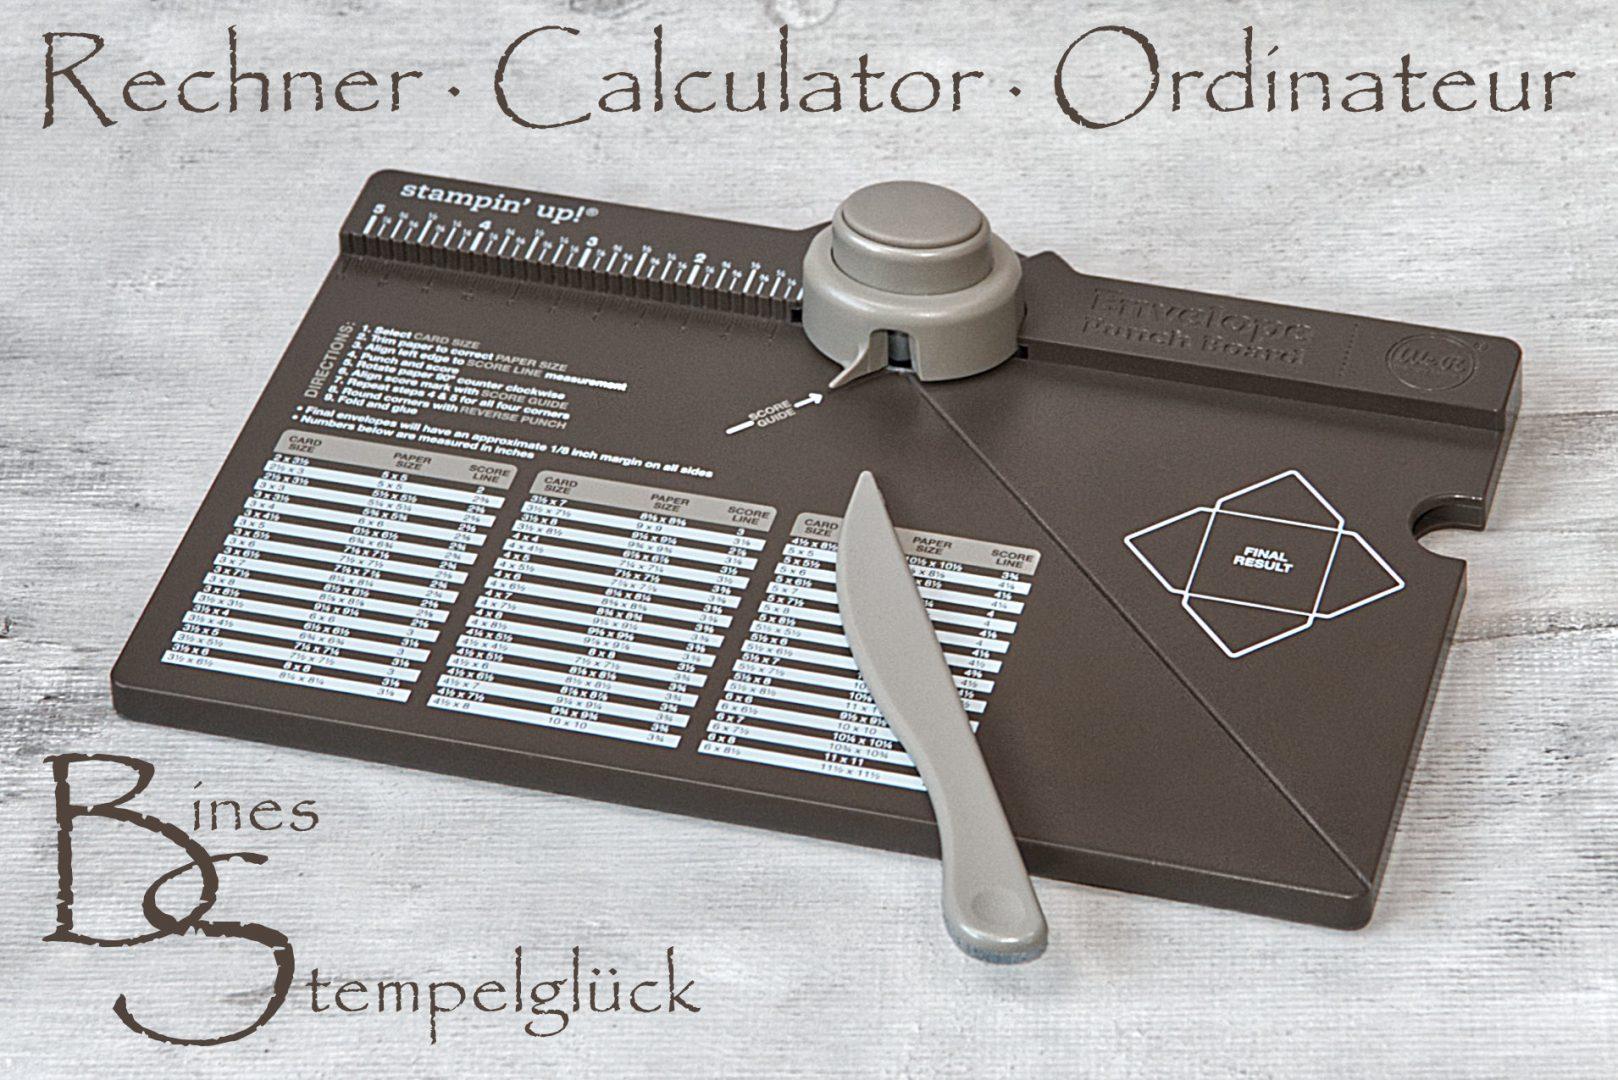 Rechner Falz- und Stanzbrett (Calculator Ordinateur)